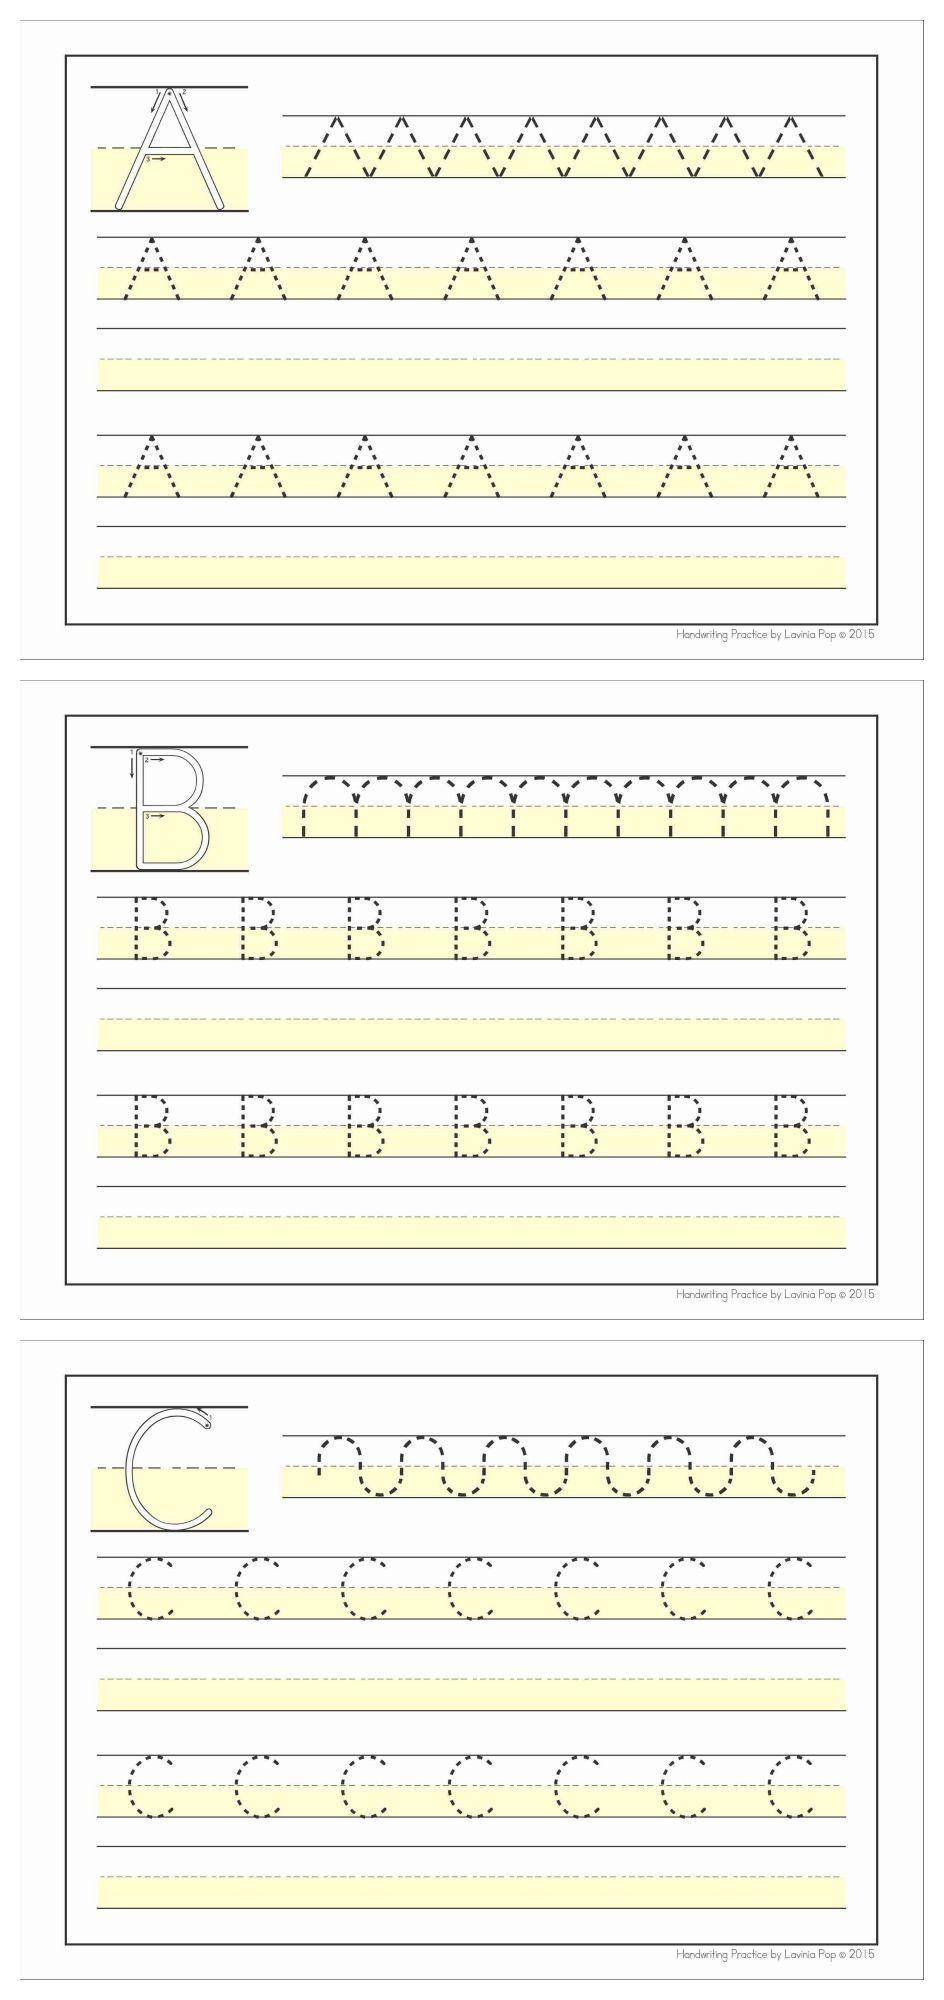 handwriting sos upper case letter size differentiation ot goodies pinterest handwriting. Black Bedroom Furniture Sets. Home Design Ideas